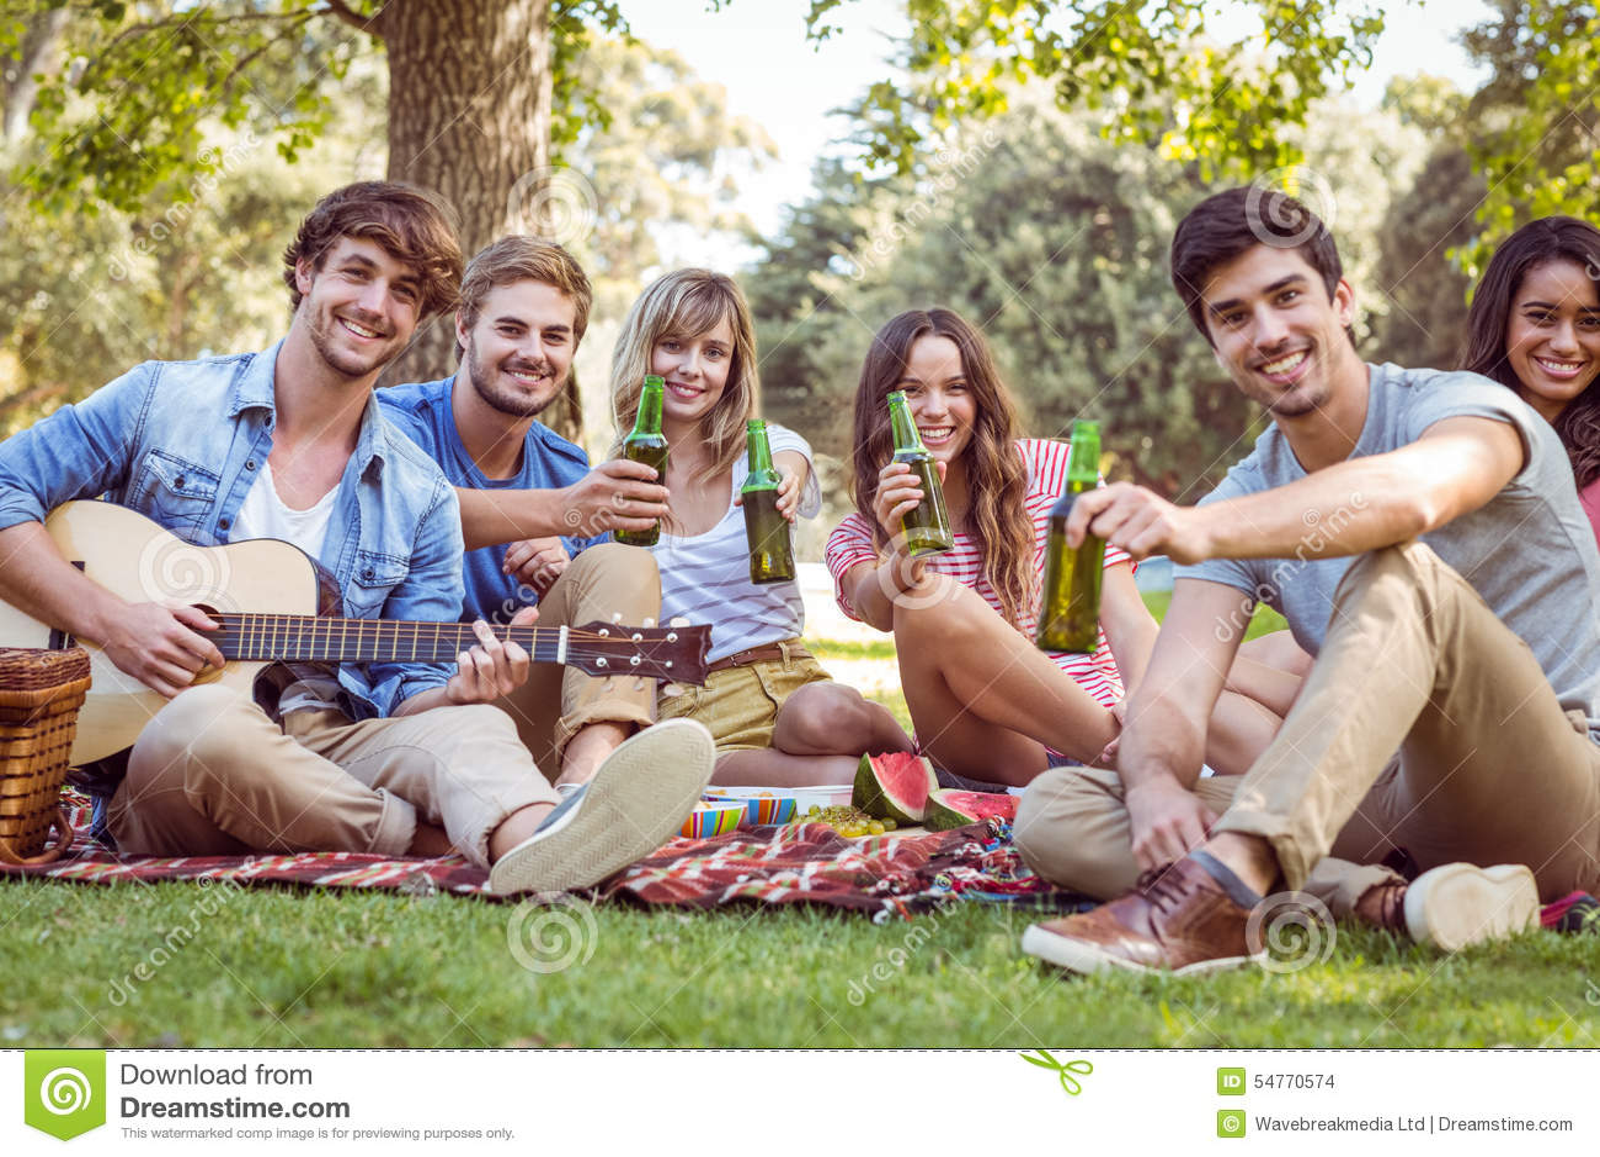 Фото на пикнике друзья идеи